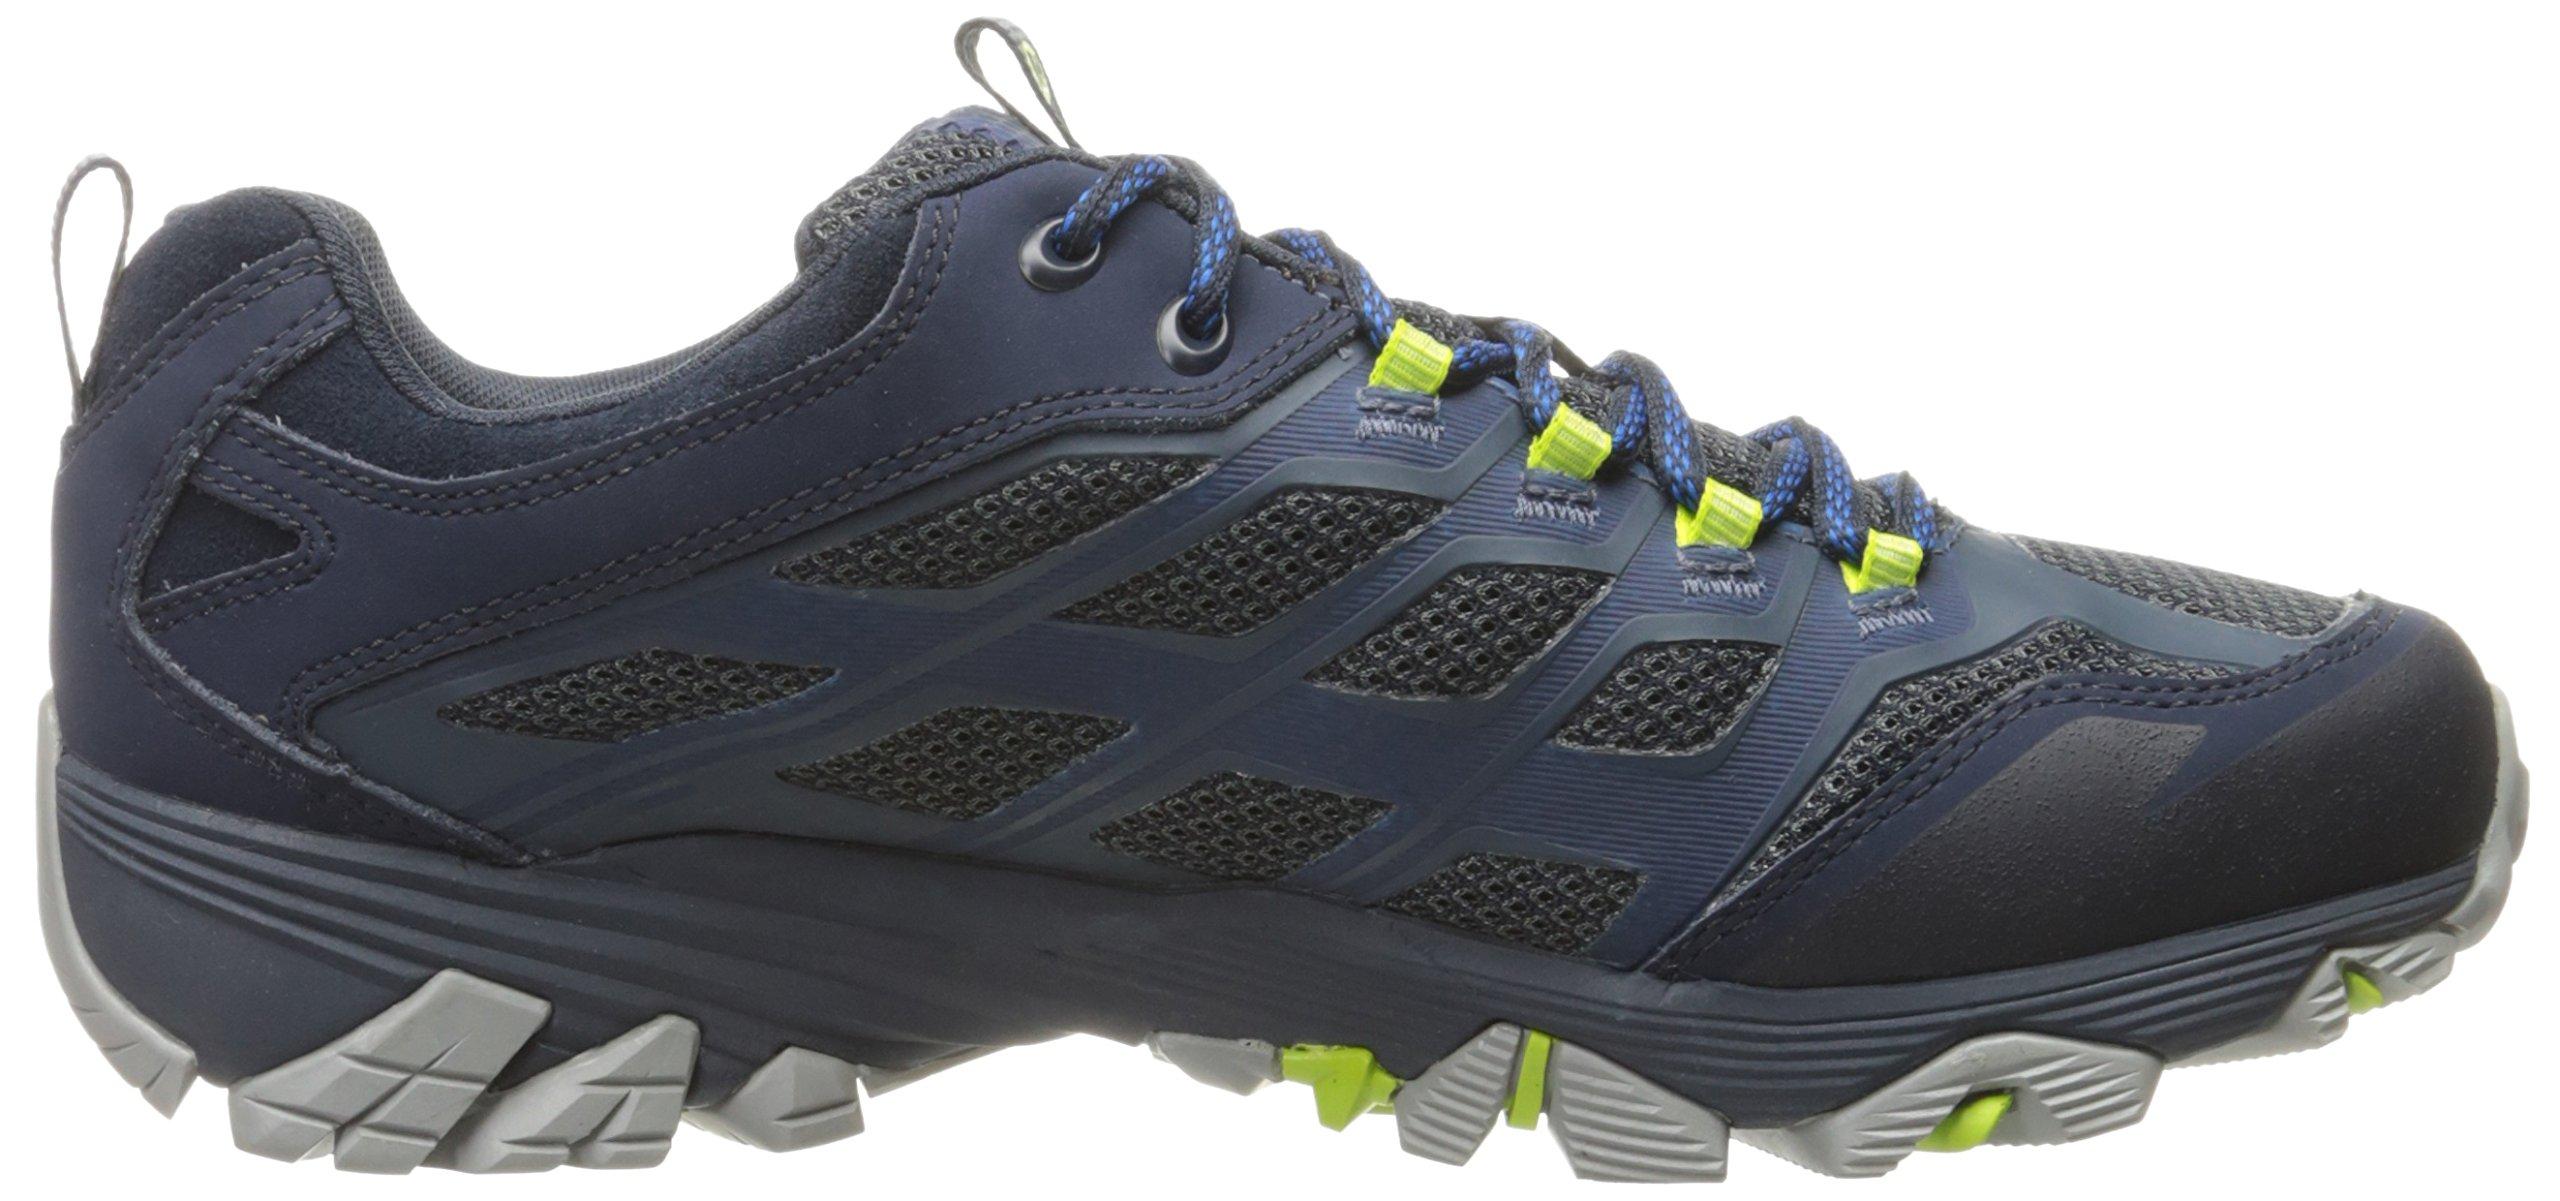 Merrell Men's Moab FST Waterproof Hiking Shoe, Navy, 8 M US by Merrell (Image #6)